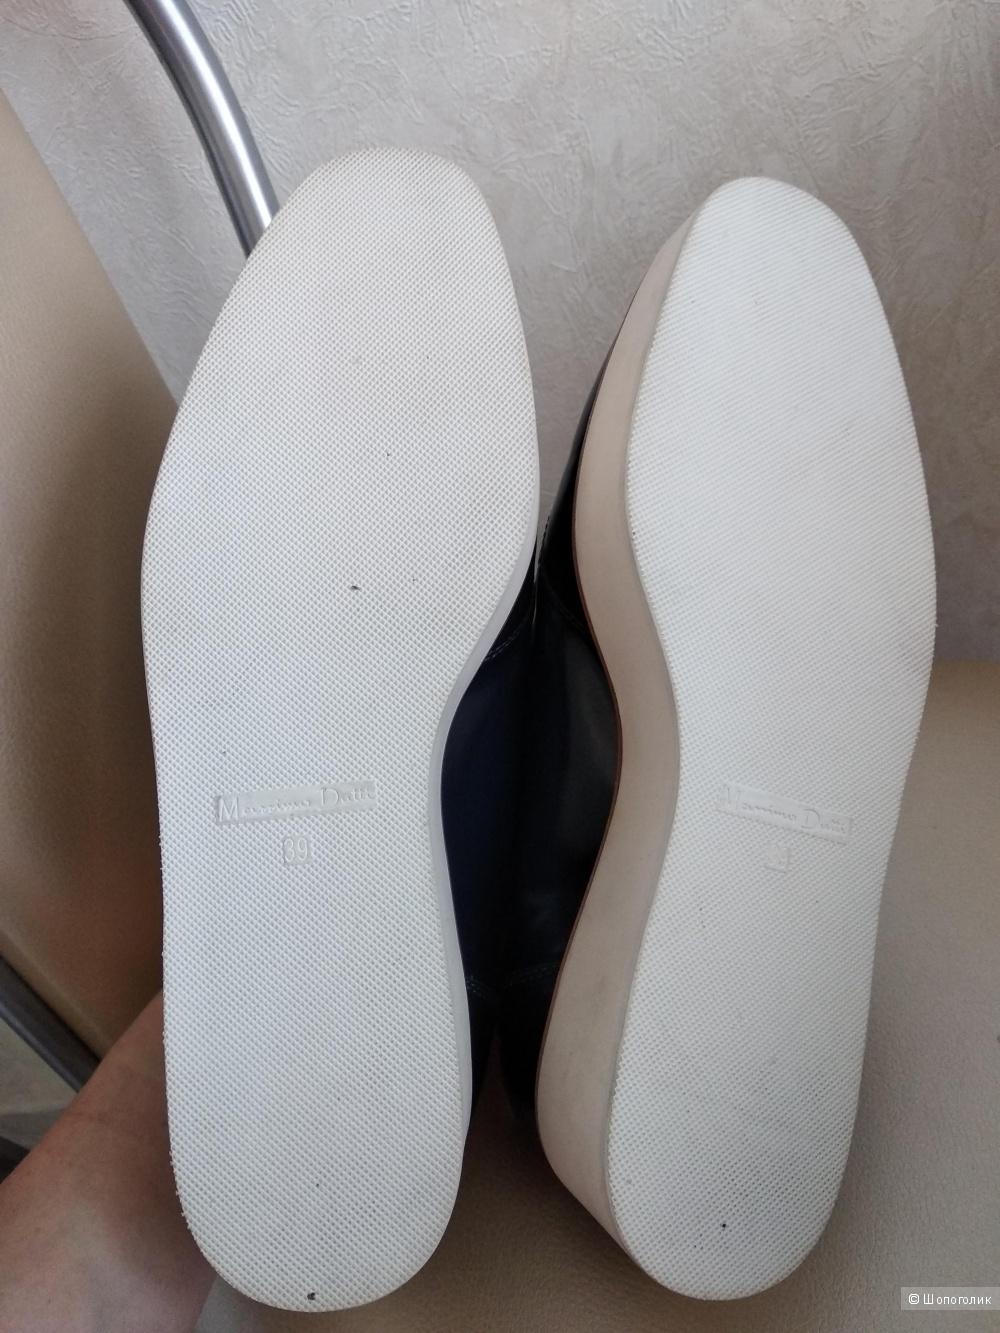 Полуботинки Massimo Dutti 39 размер